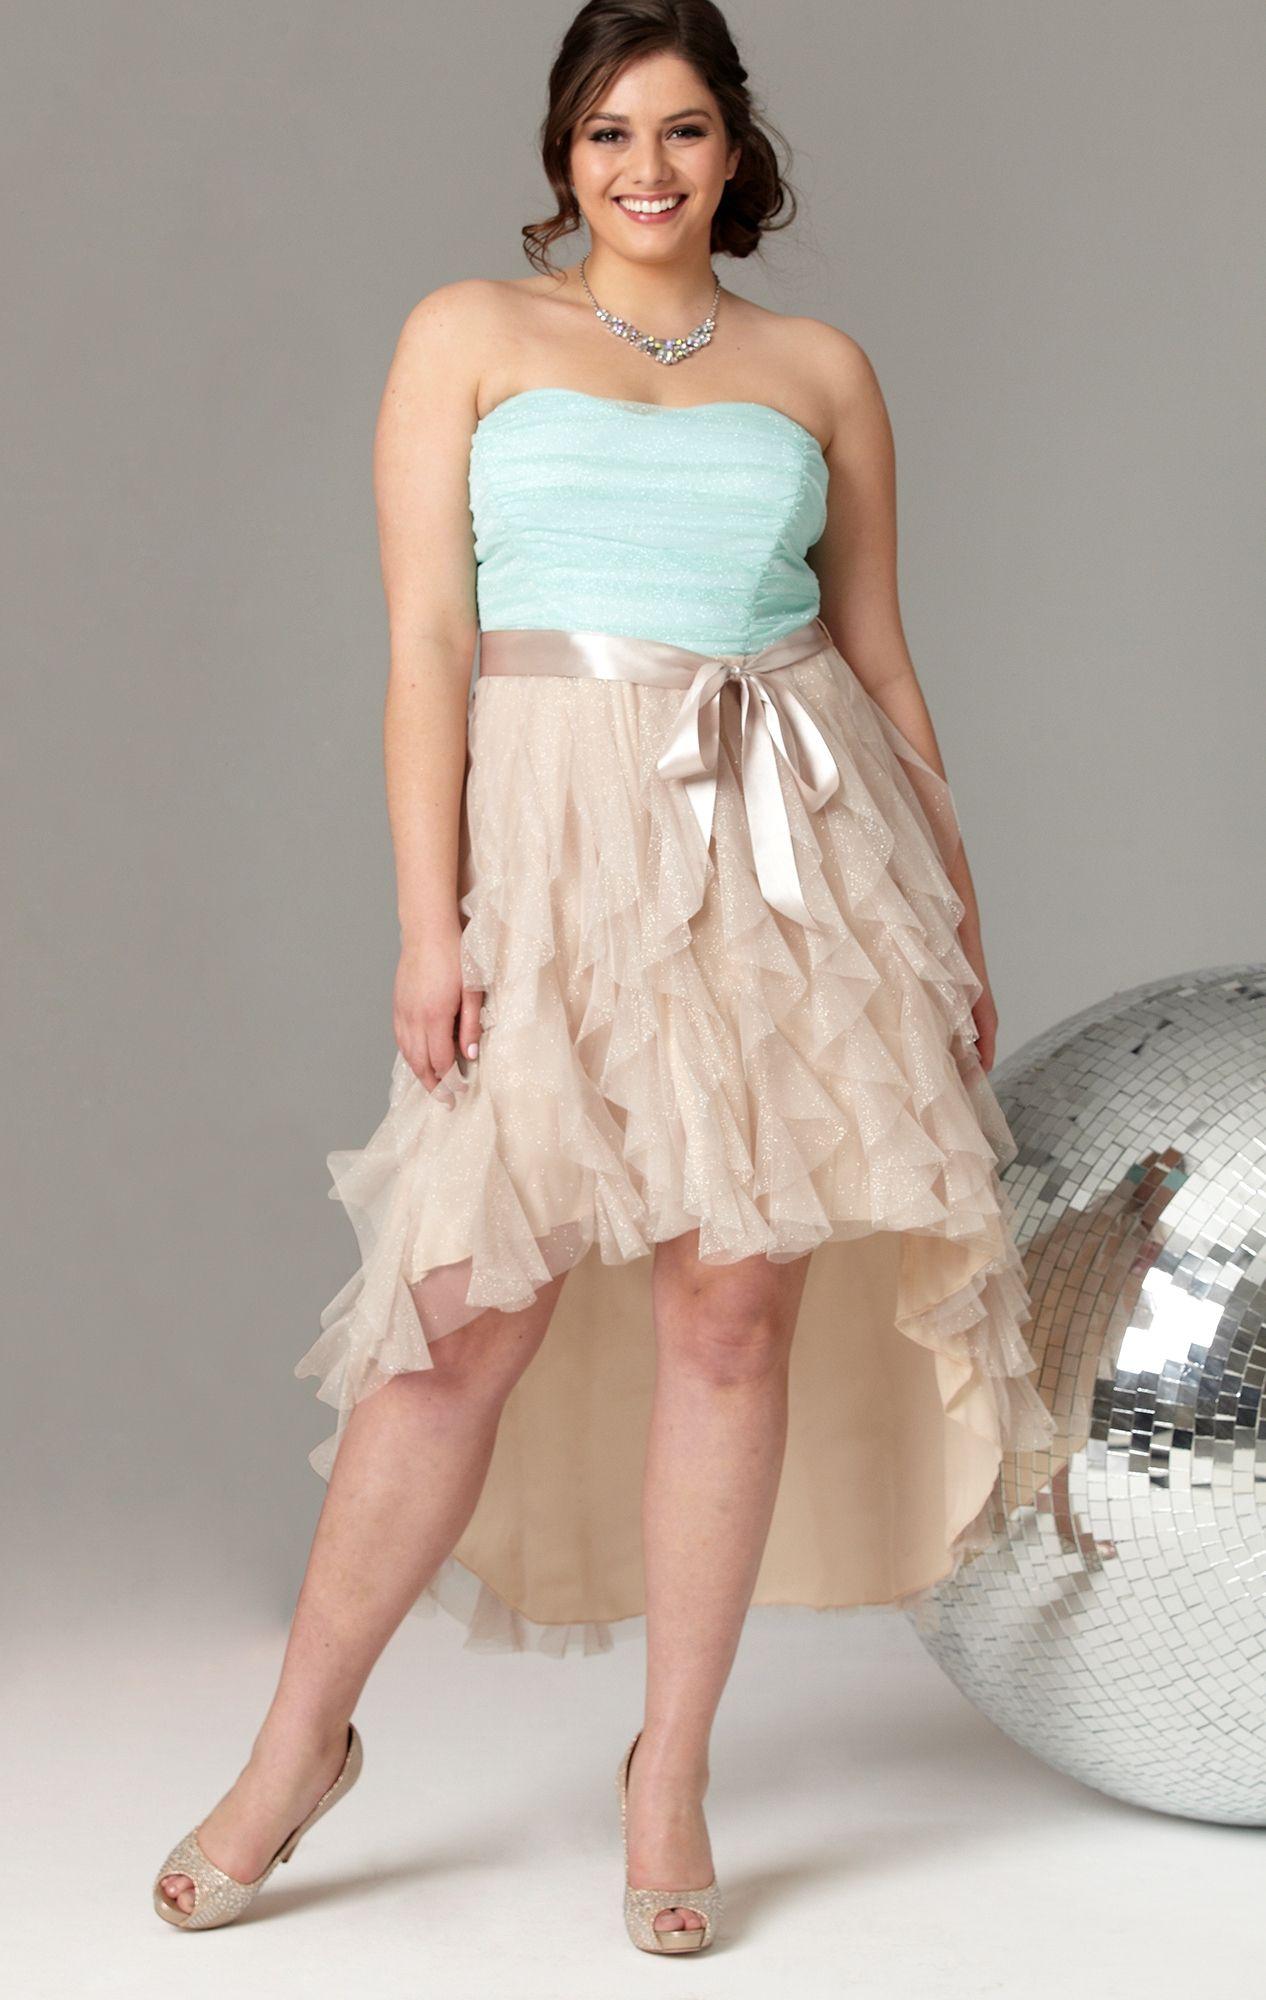 Short wedding dresses plus size  Short Wedding Dresses Plus Size  How to Dress for A Wedding Check